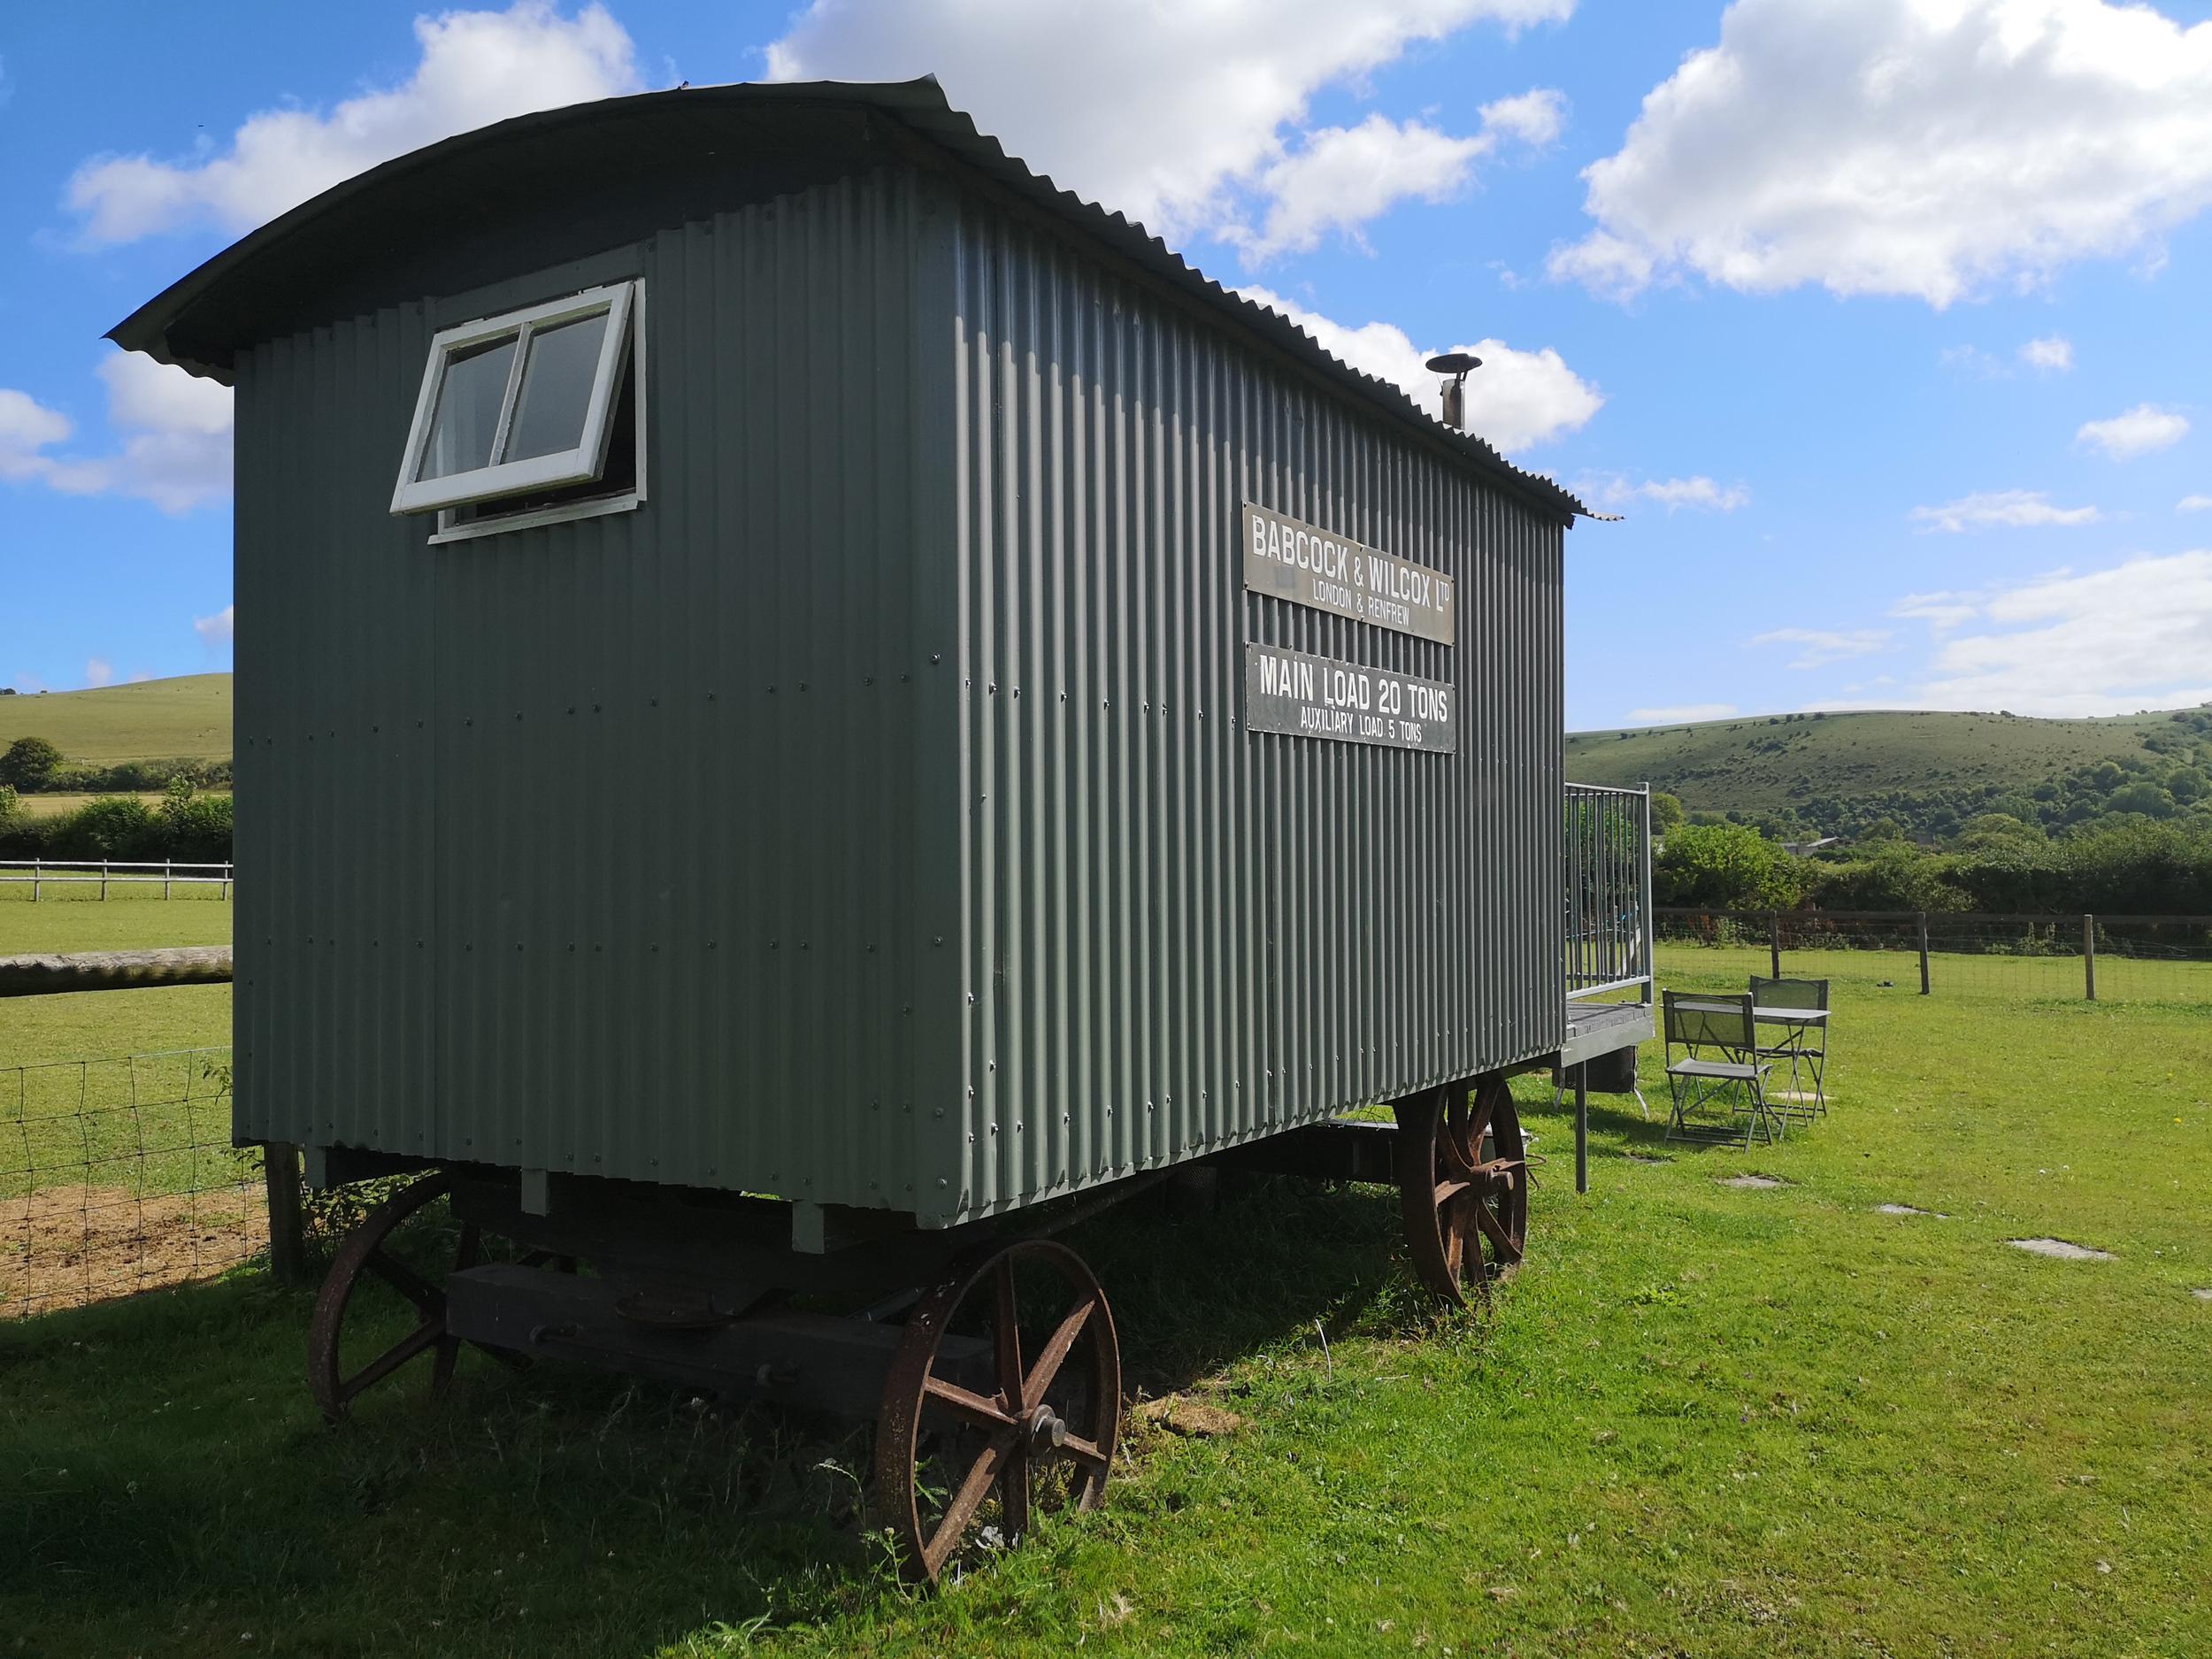 Hut-View